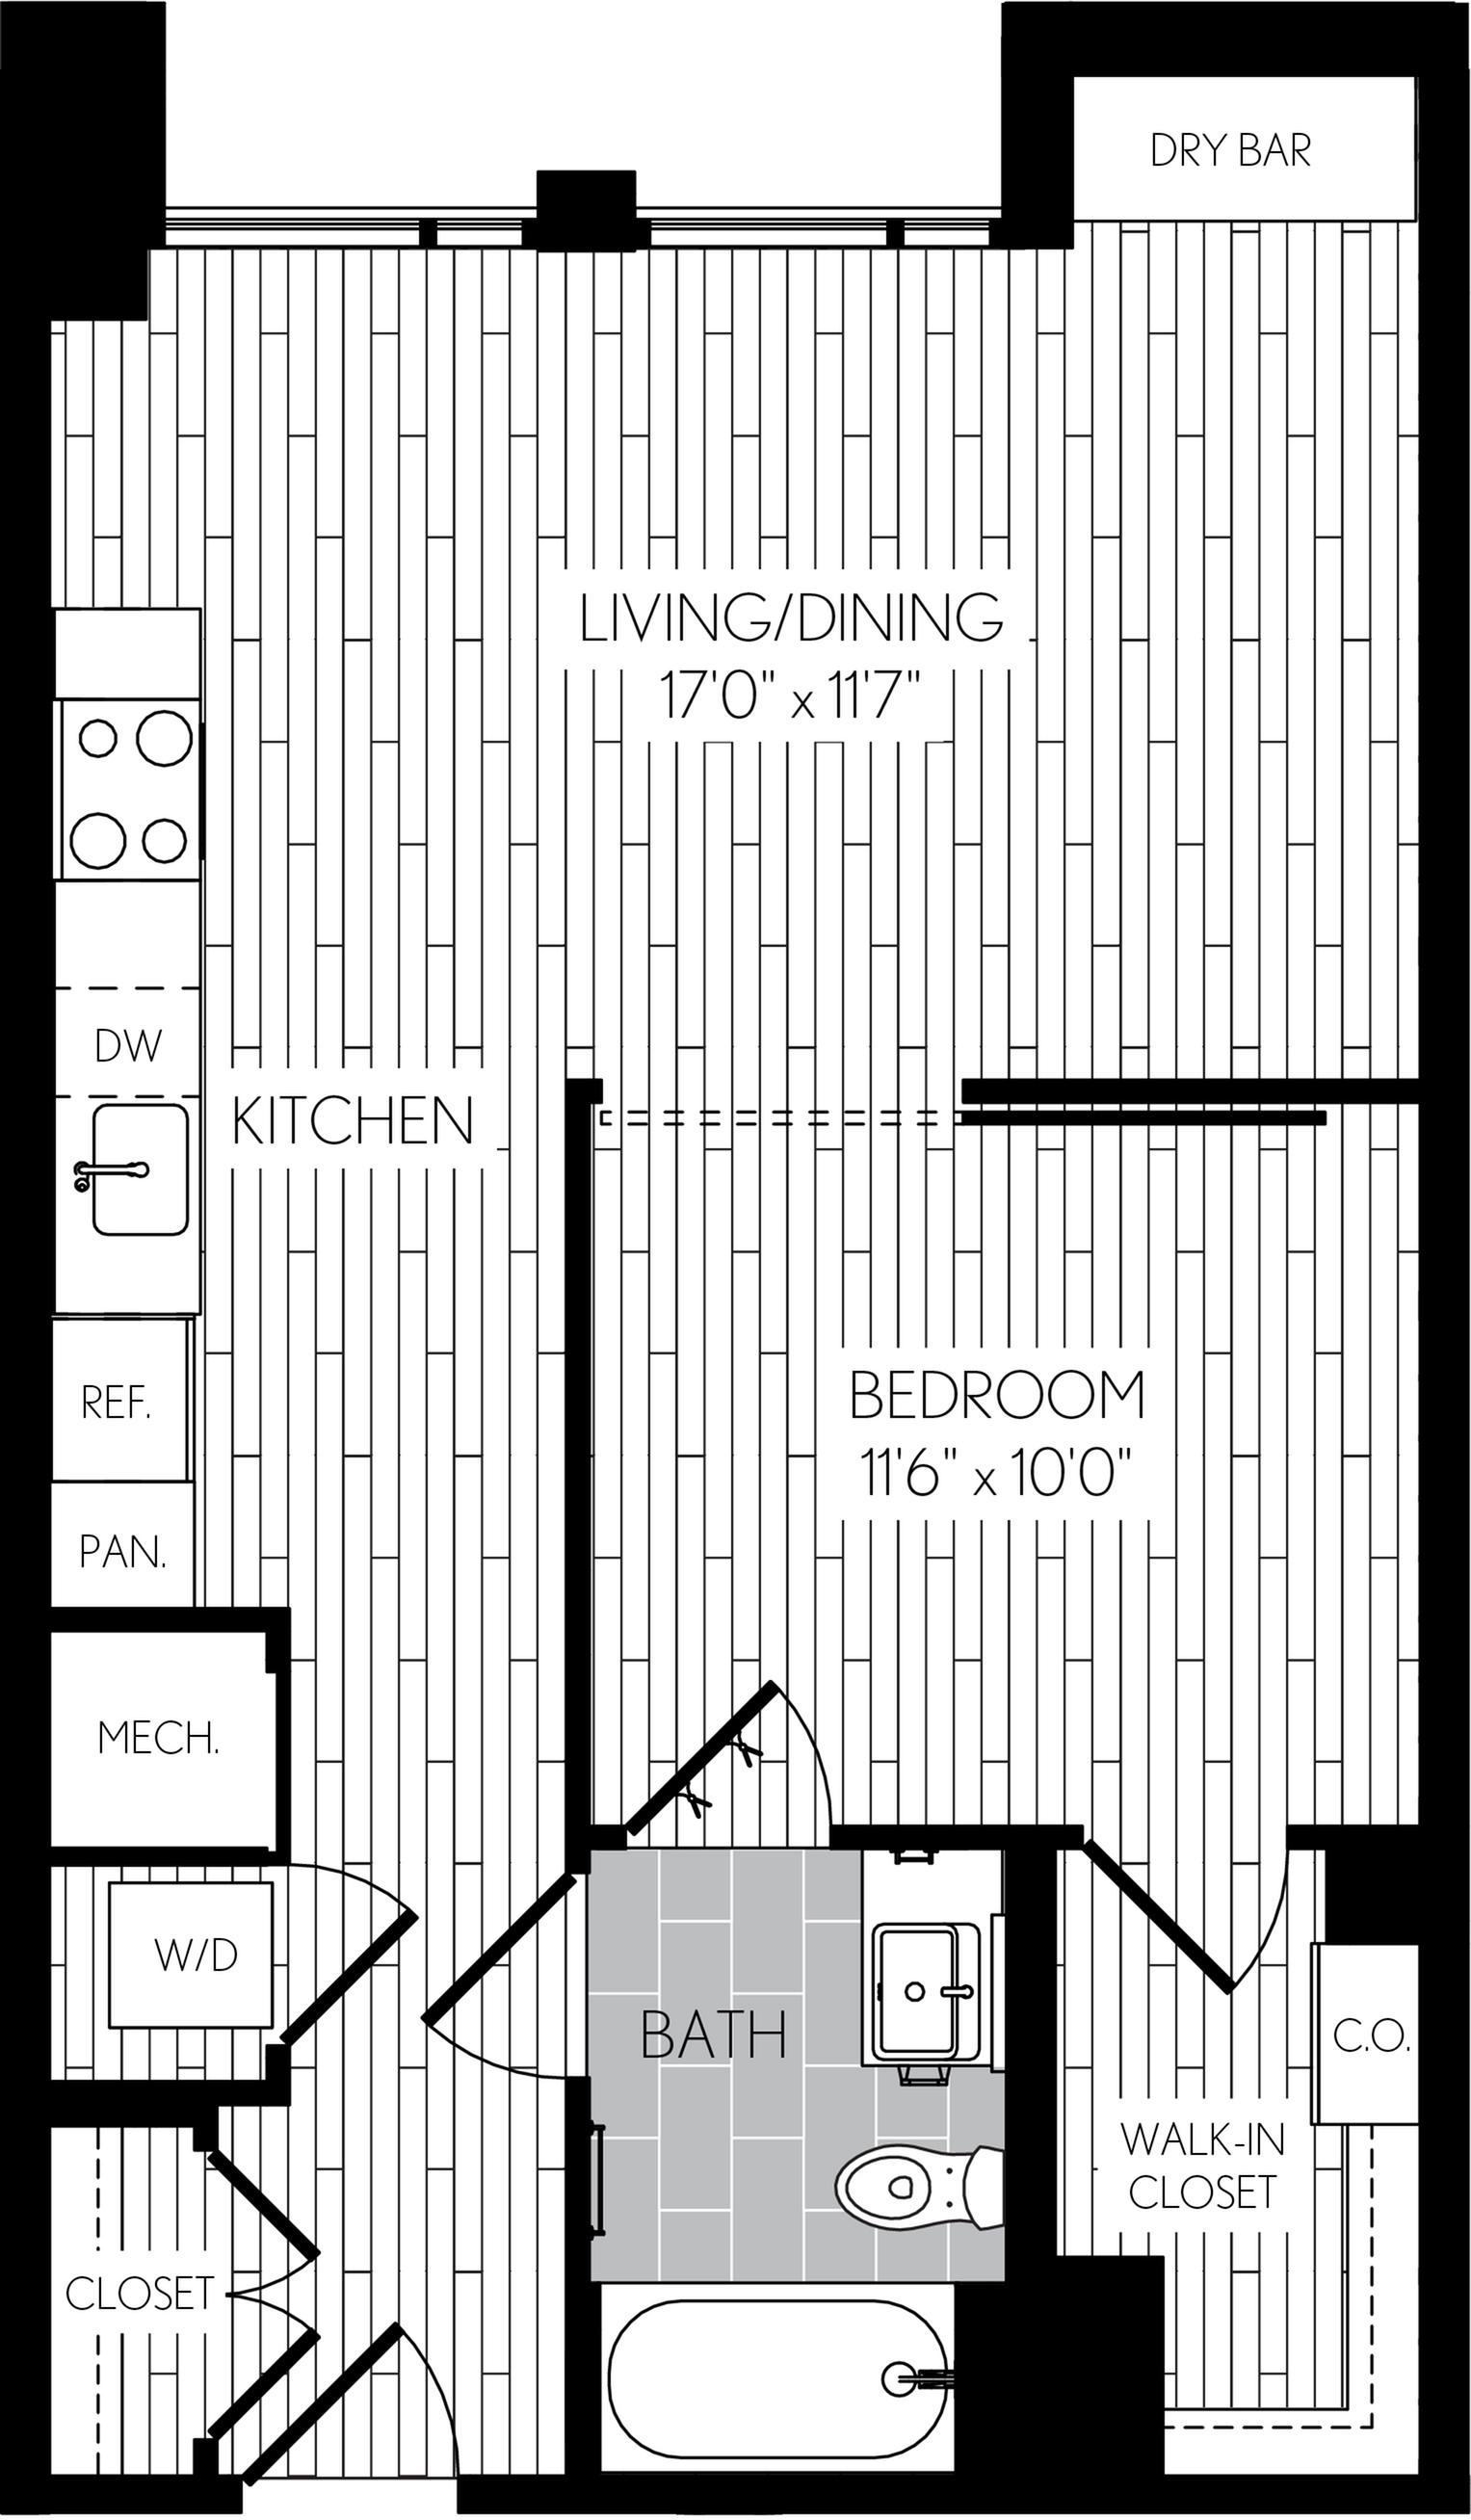 649 square foot one bedroom one bath apartment floorplan image